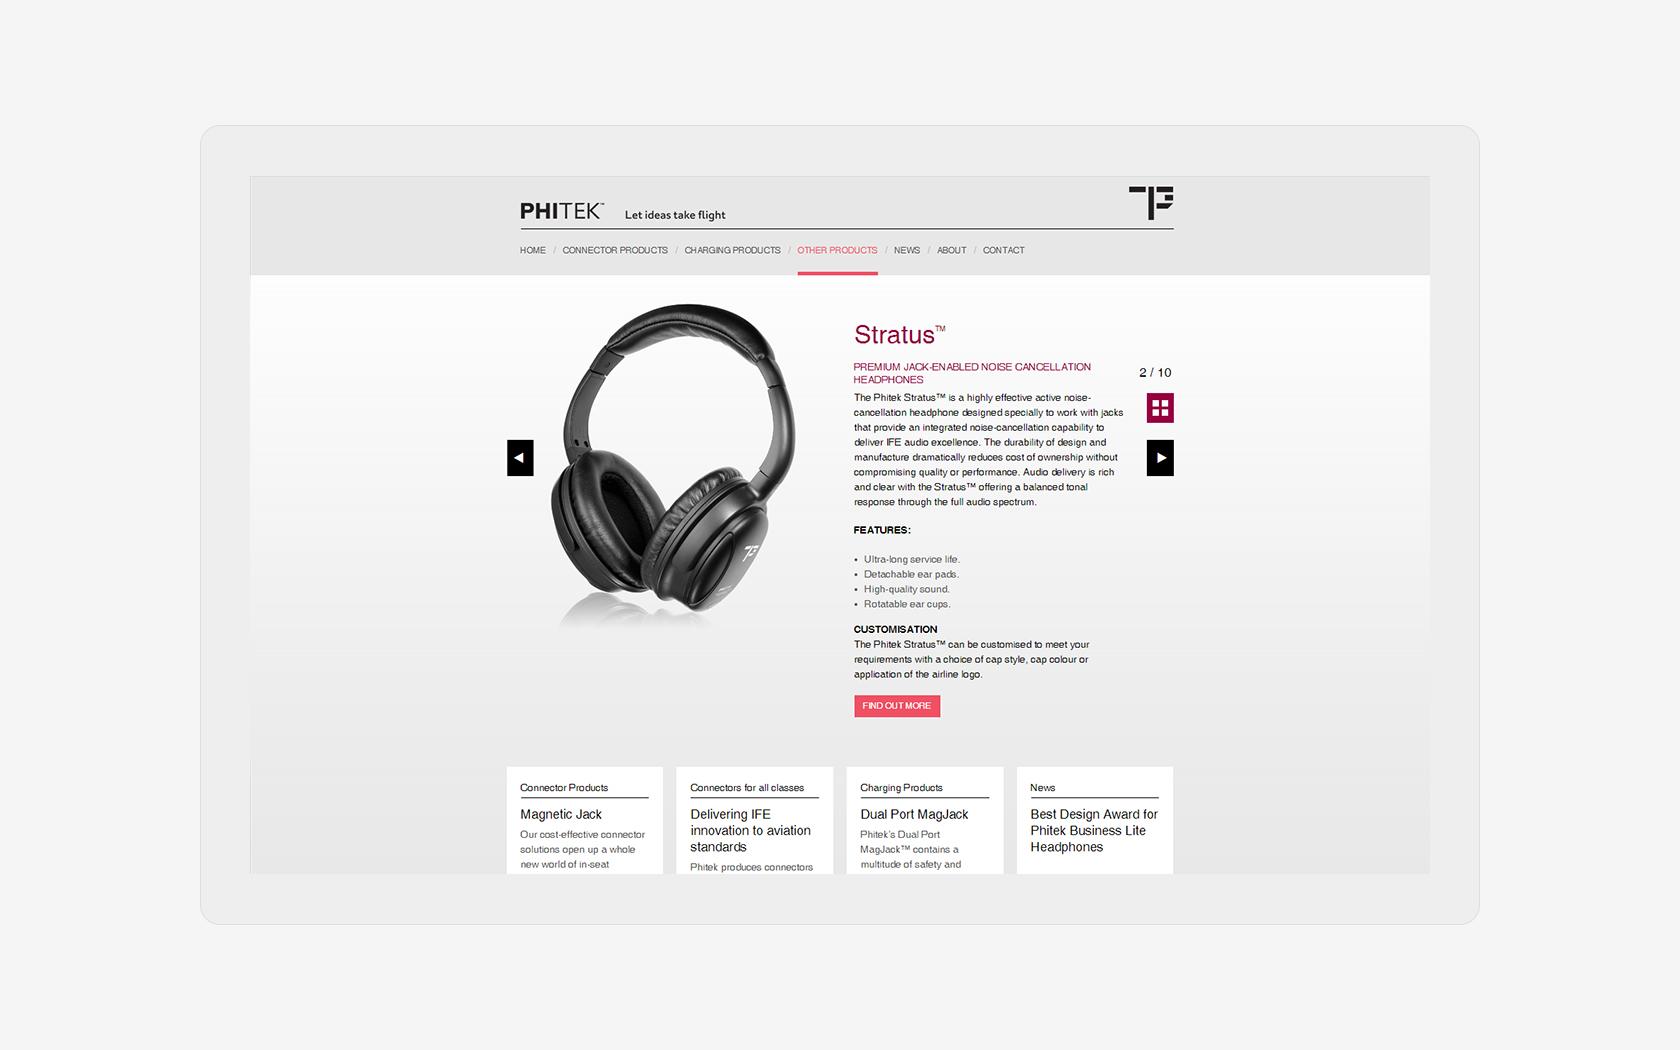 Phitek Desktop Product Page